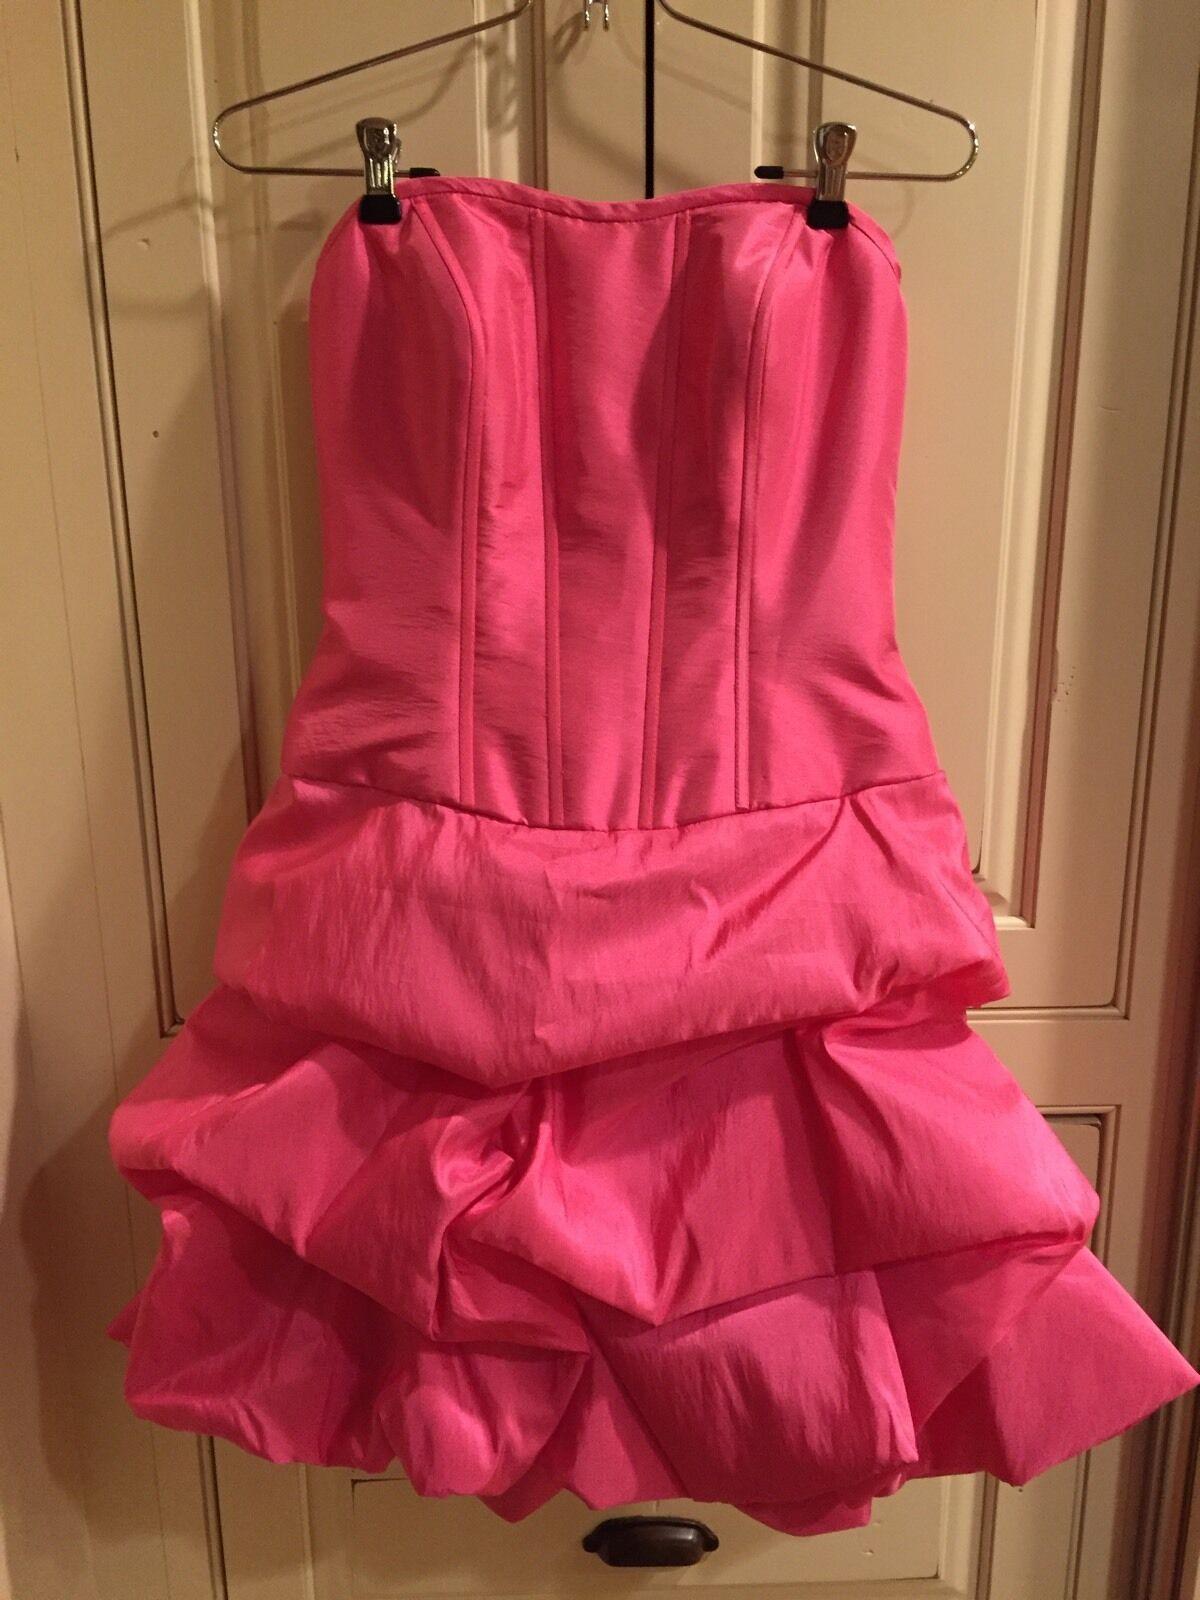 NWT Mori Lee Sticks & Stones Dress 9029 Homecoming Mini Neon Pink Size 5/6